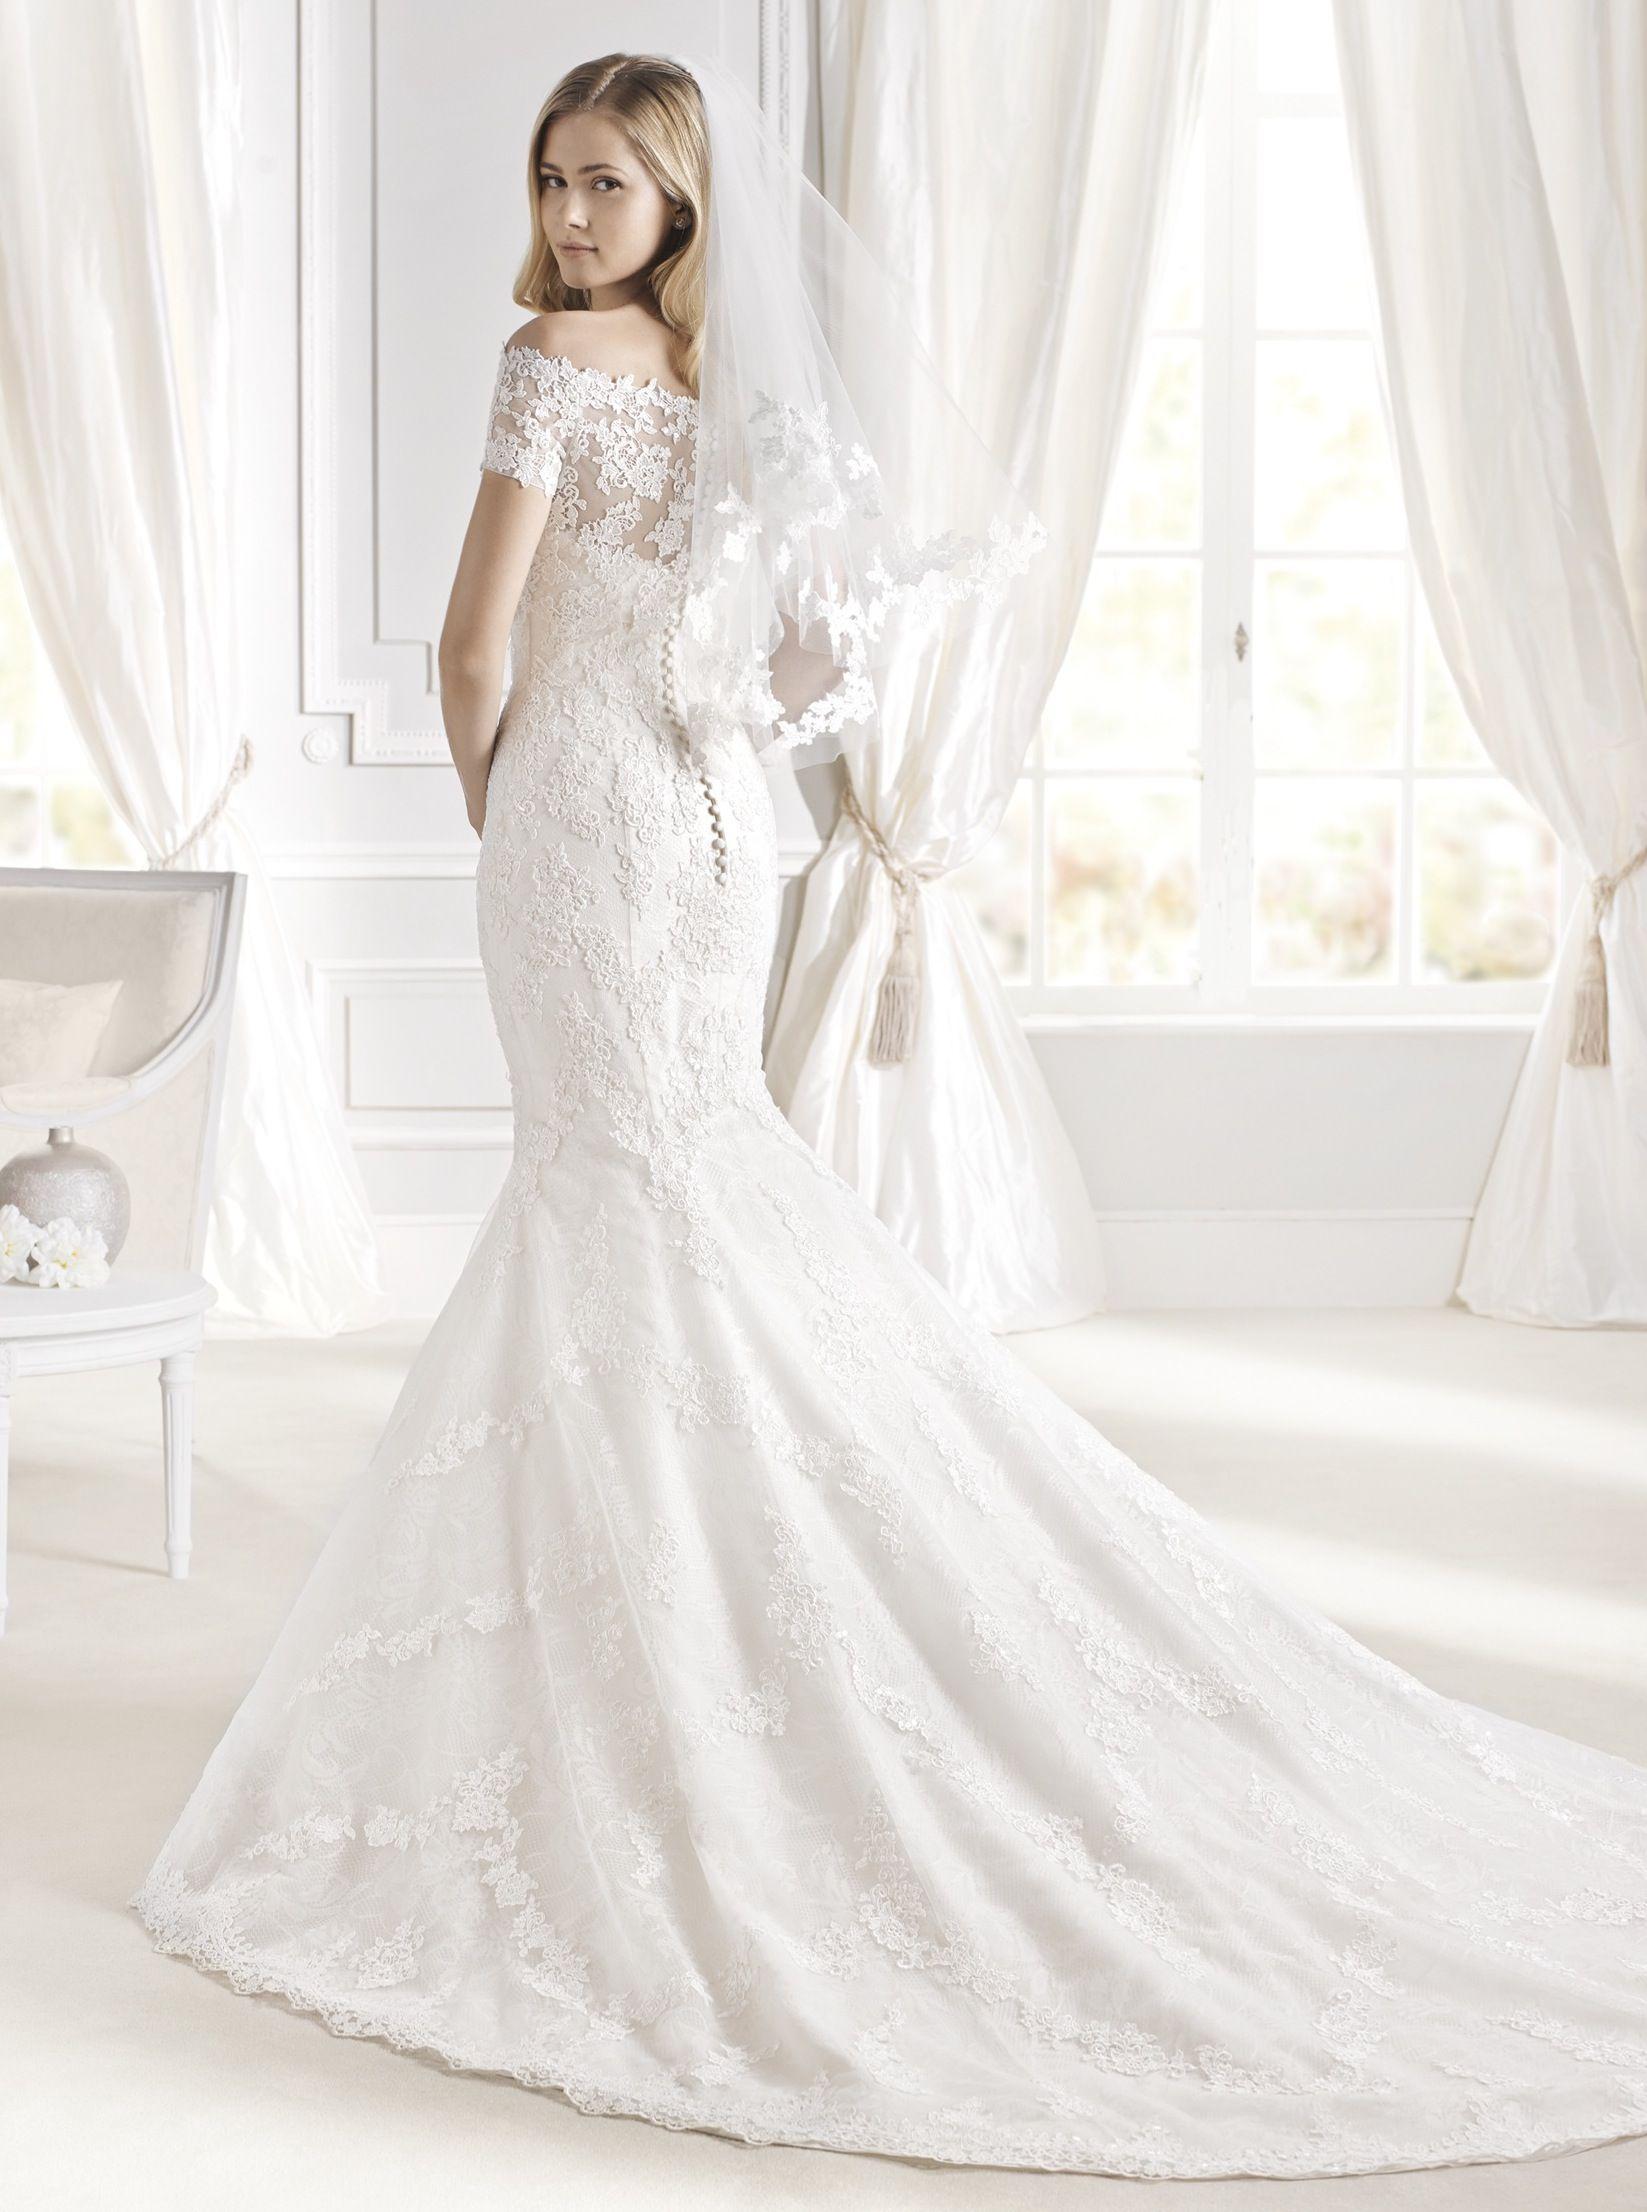 3e046a3c83304 IDALINA La Sposa, 2015 collection! #idalina #lasposa #bridal available now  at www.emmavictoriapayne.com